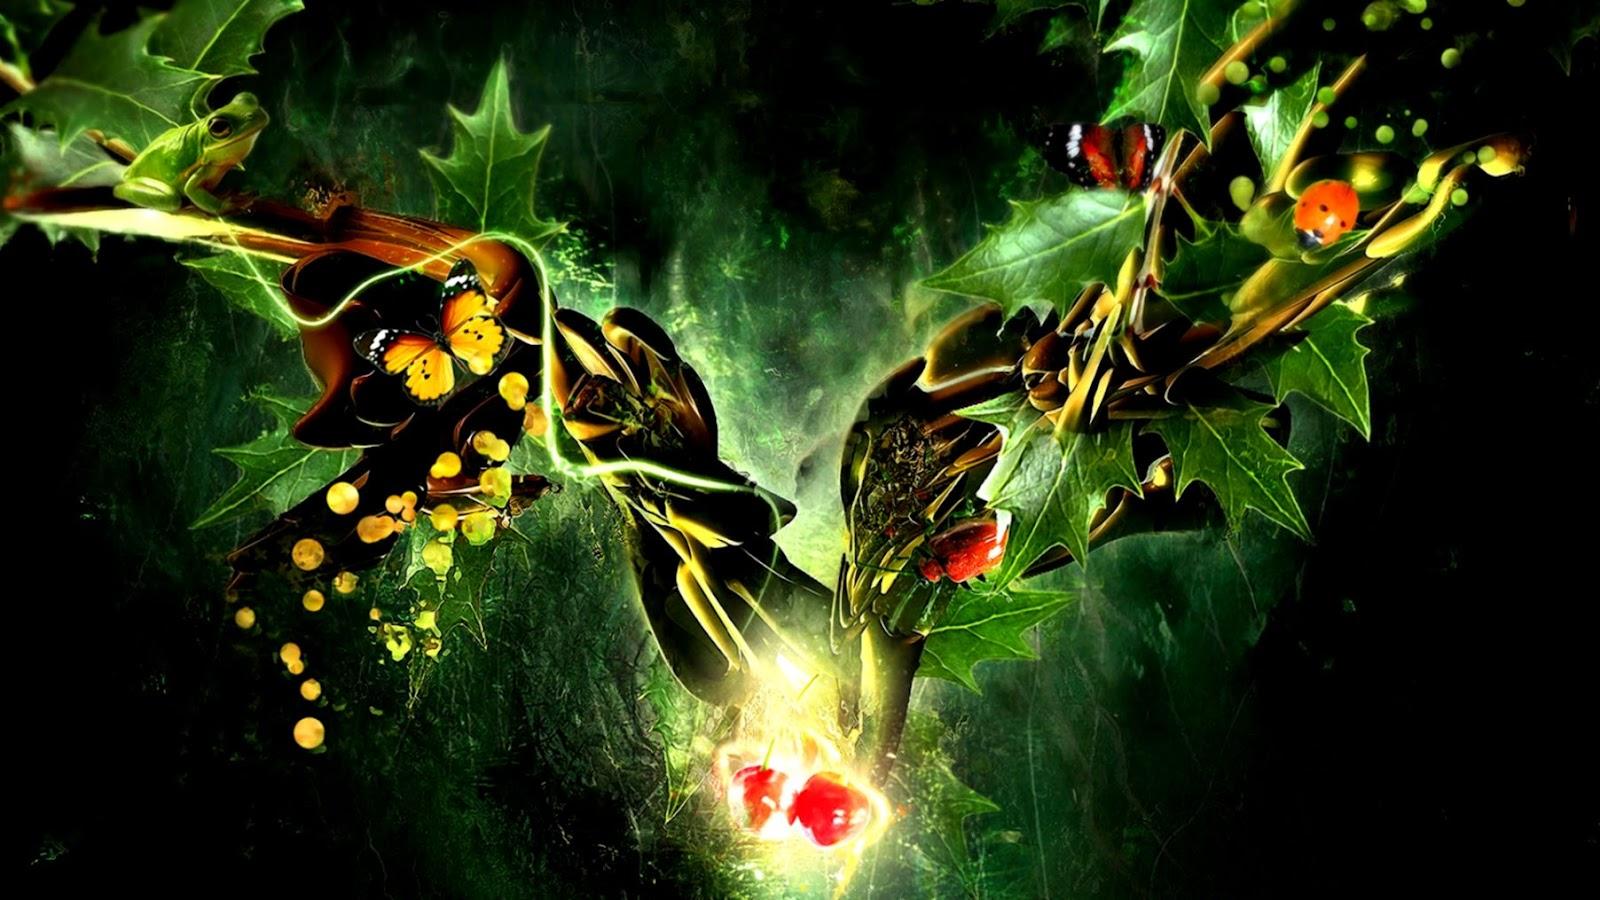 3D Butterfly Screensaver Download   Best HD Wallpapers